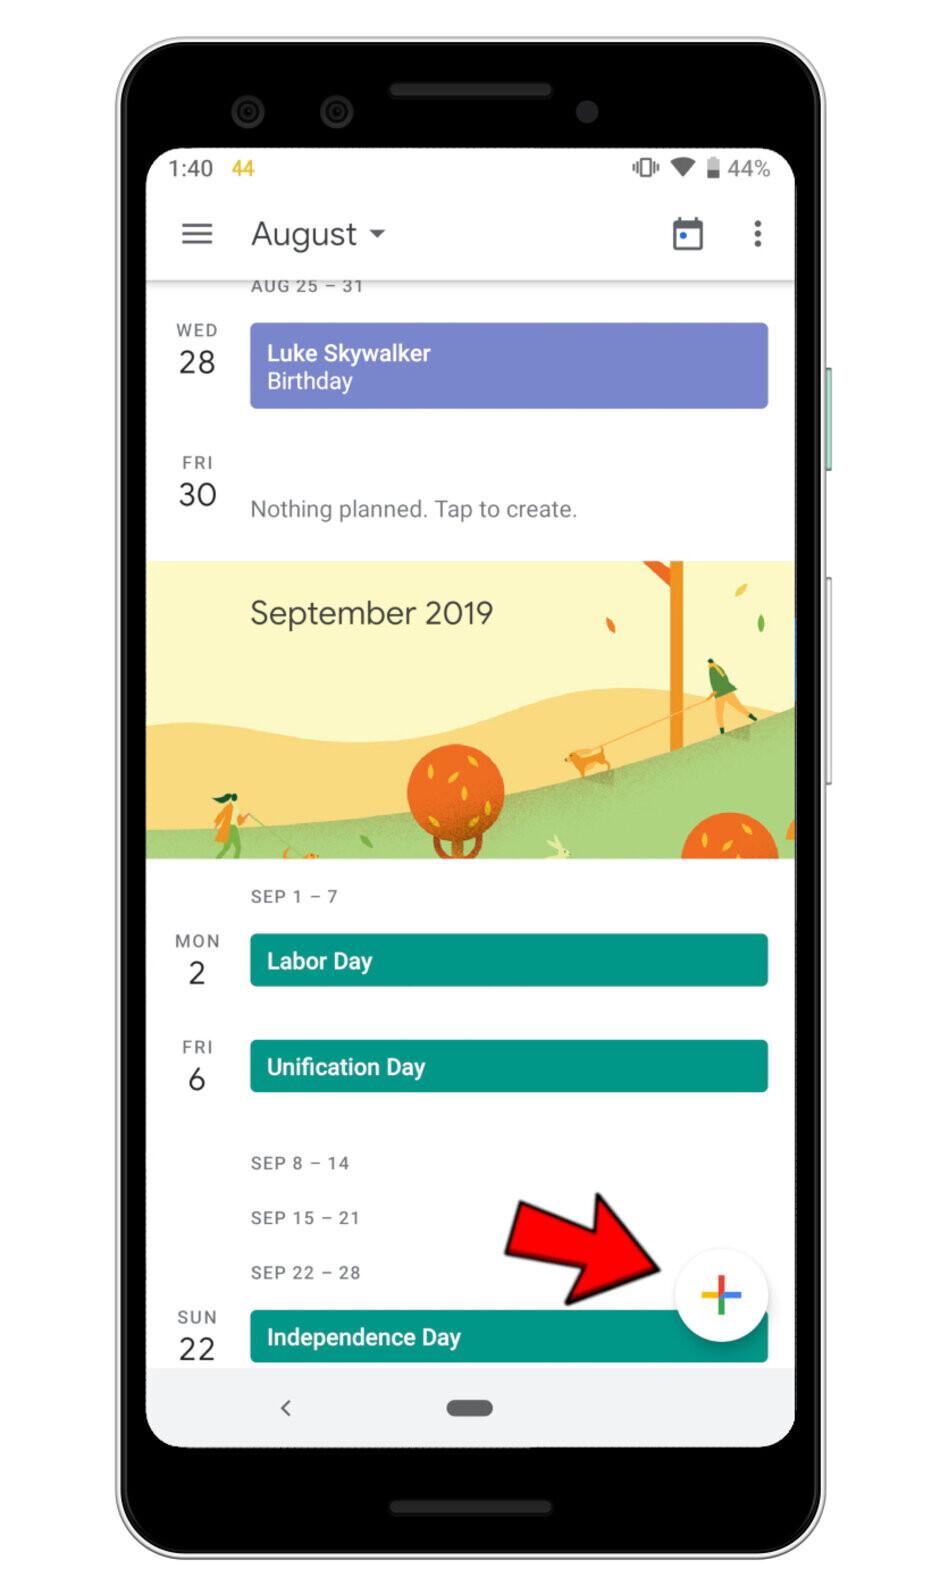 How to add a birthday to Google Calendar